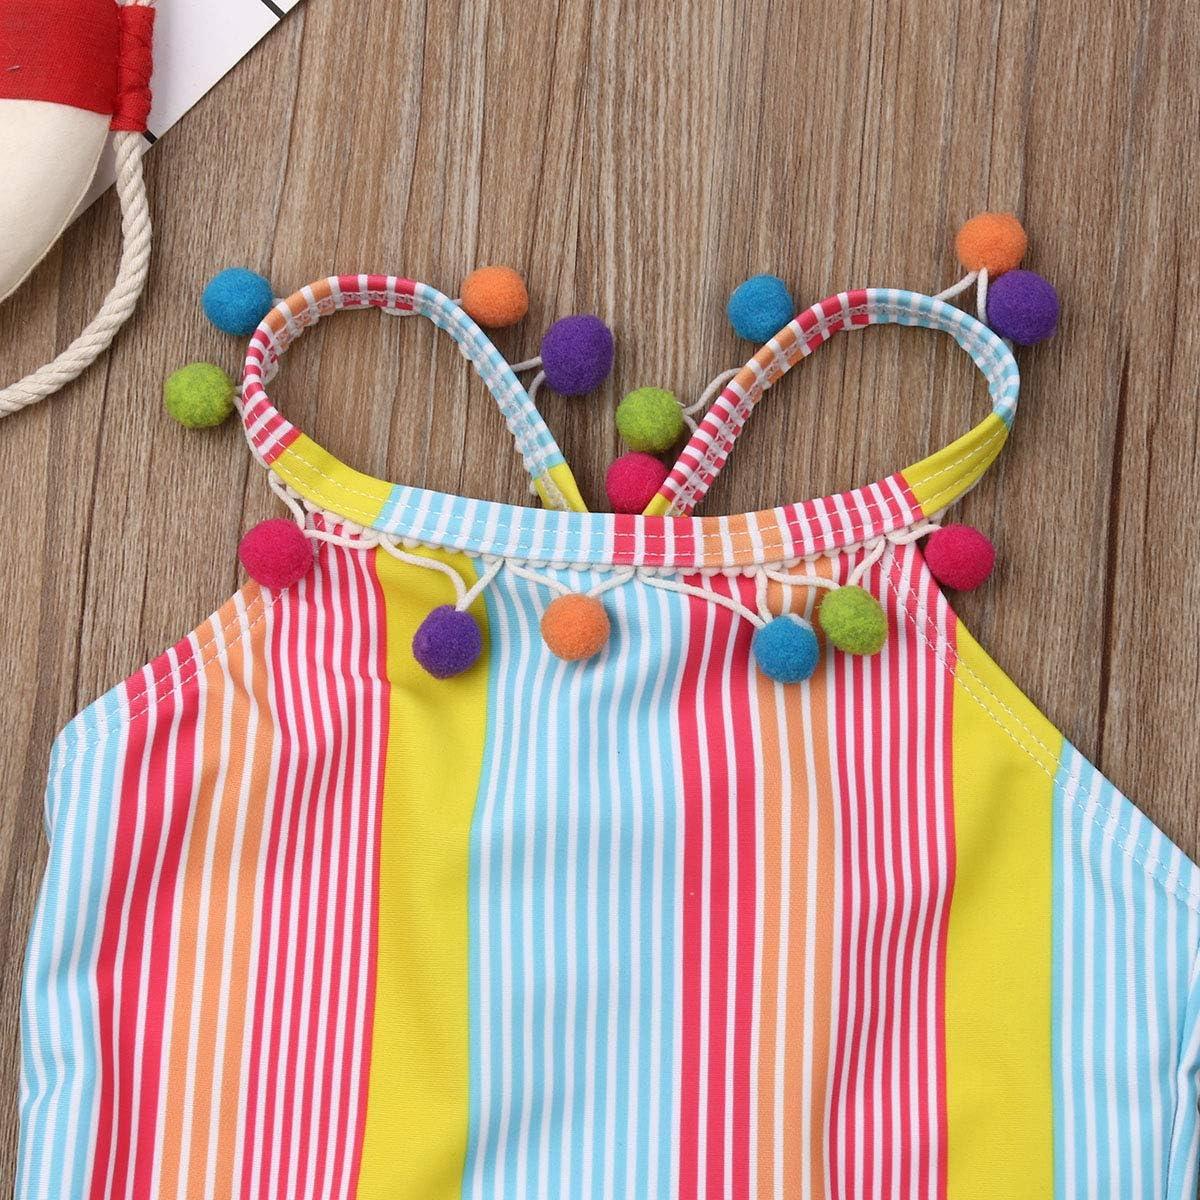 Mother and Daughter Summer Swimsuit Striped Bikini Set Tassel Ball One Pieces Suit Swimwear Beachwear Bathing Suit